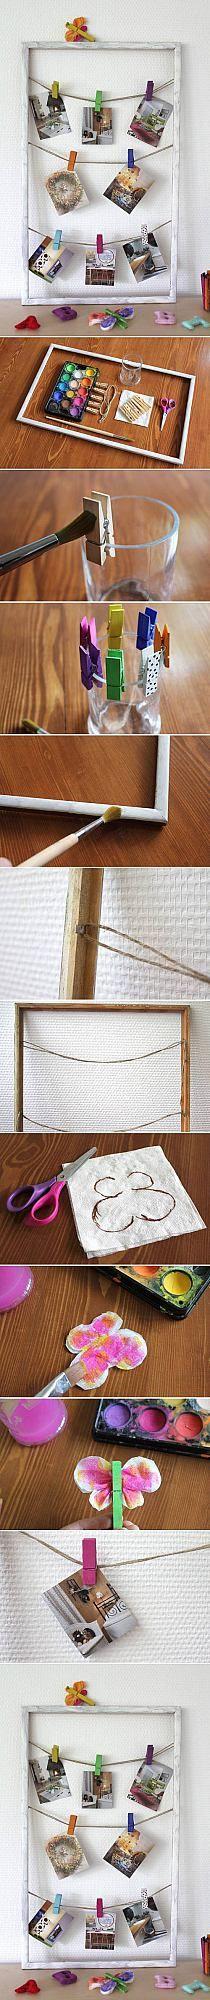 DIY Egg Carton Decorative Mirror DIY Projects | UsefulD…